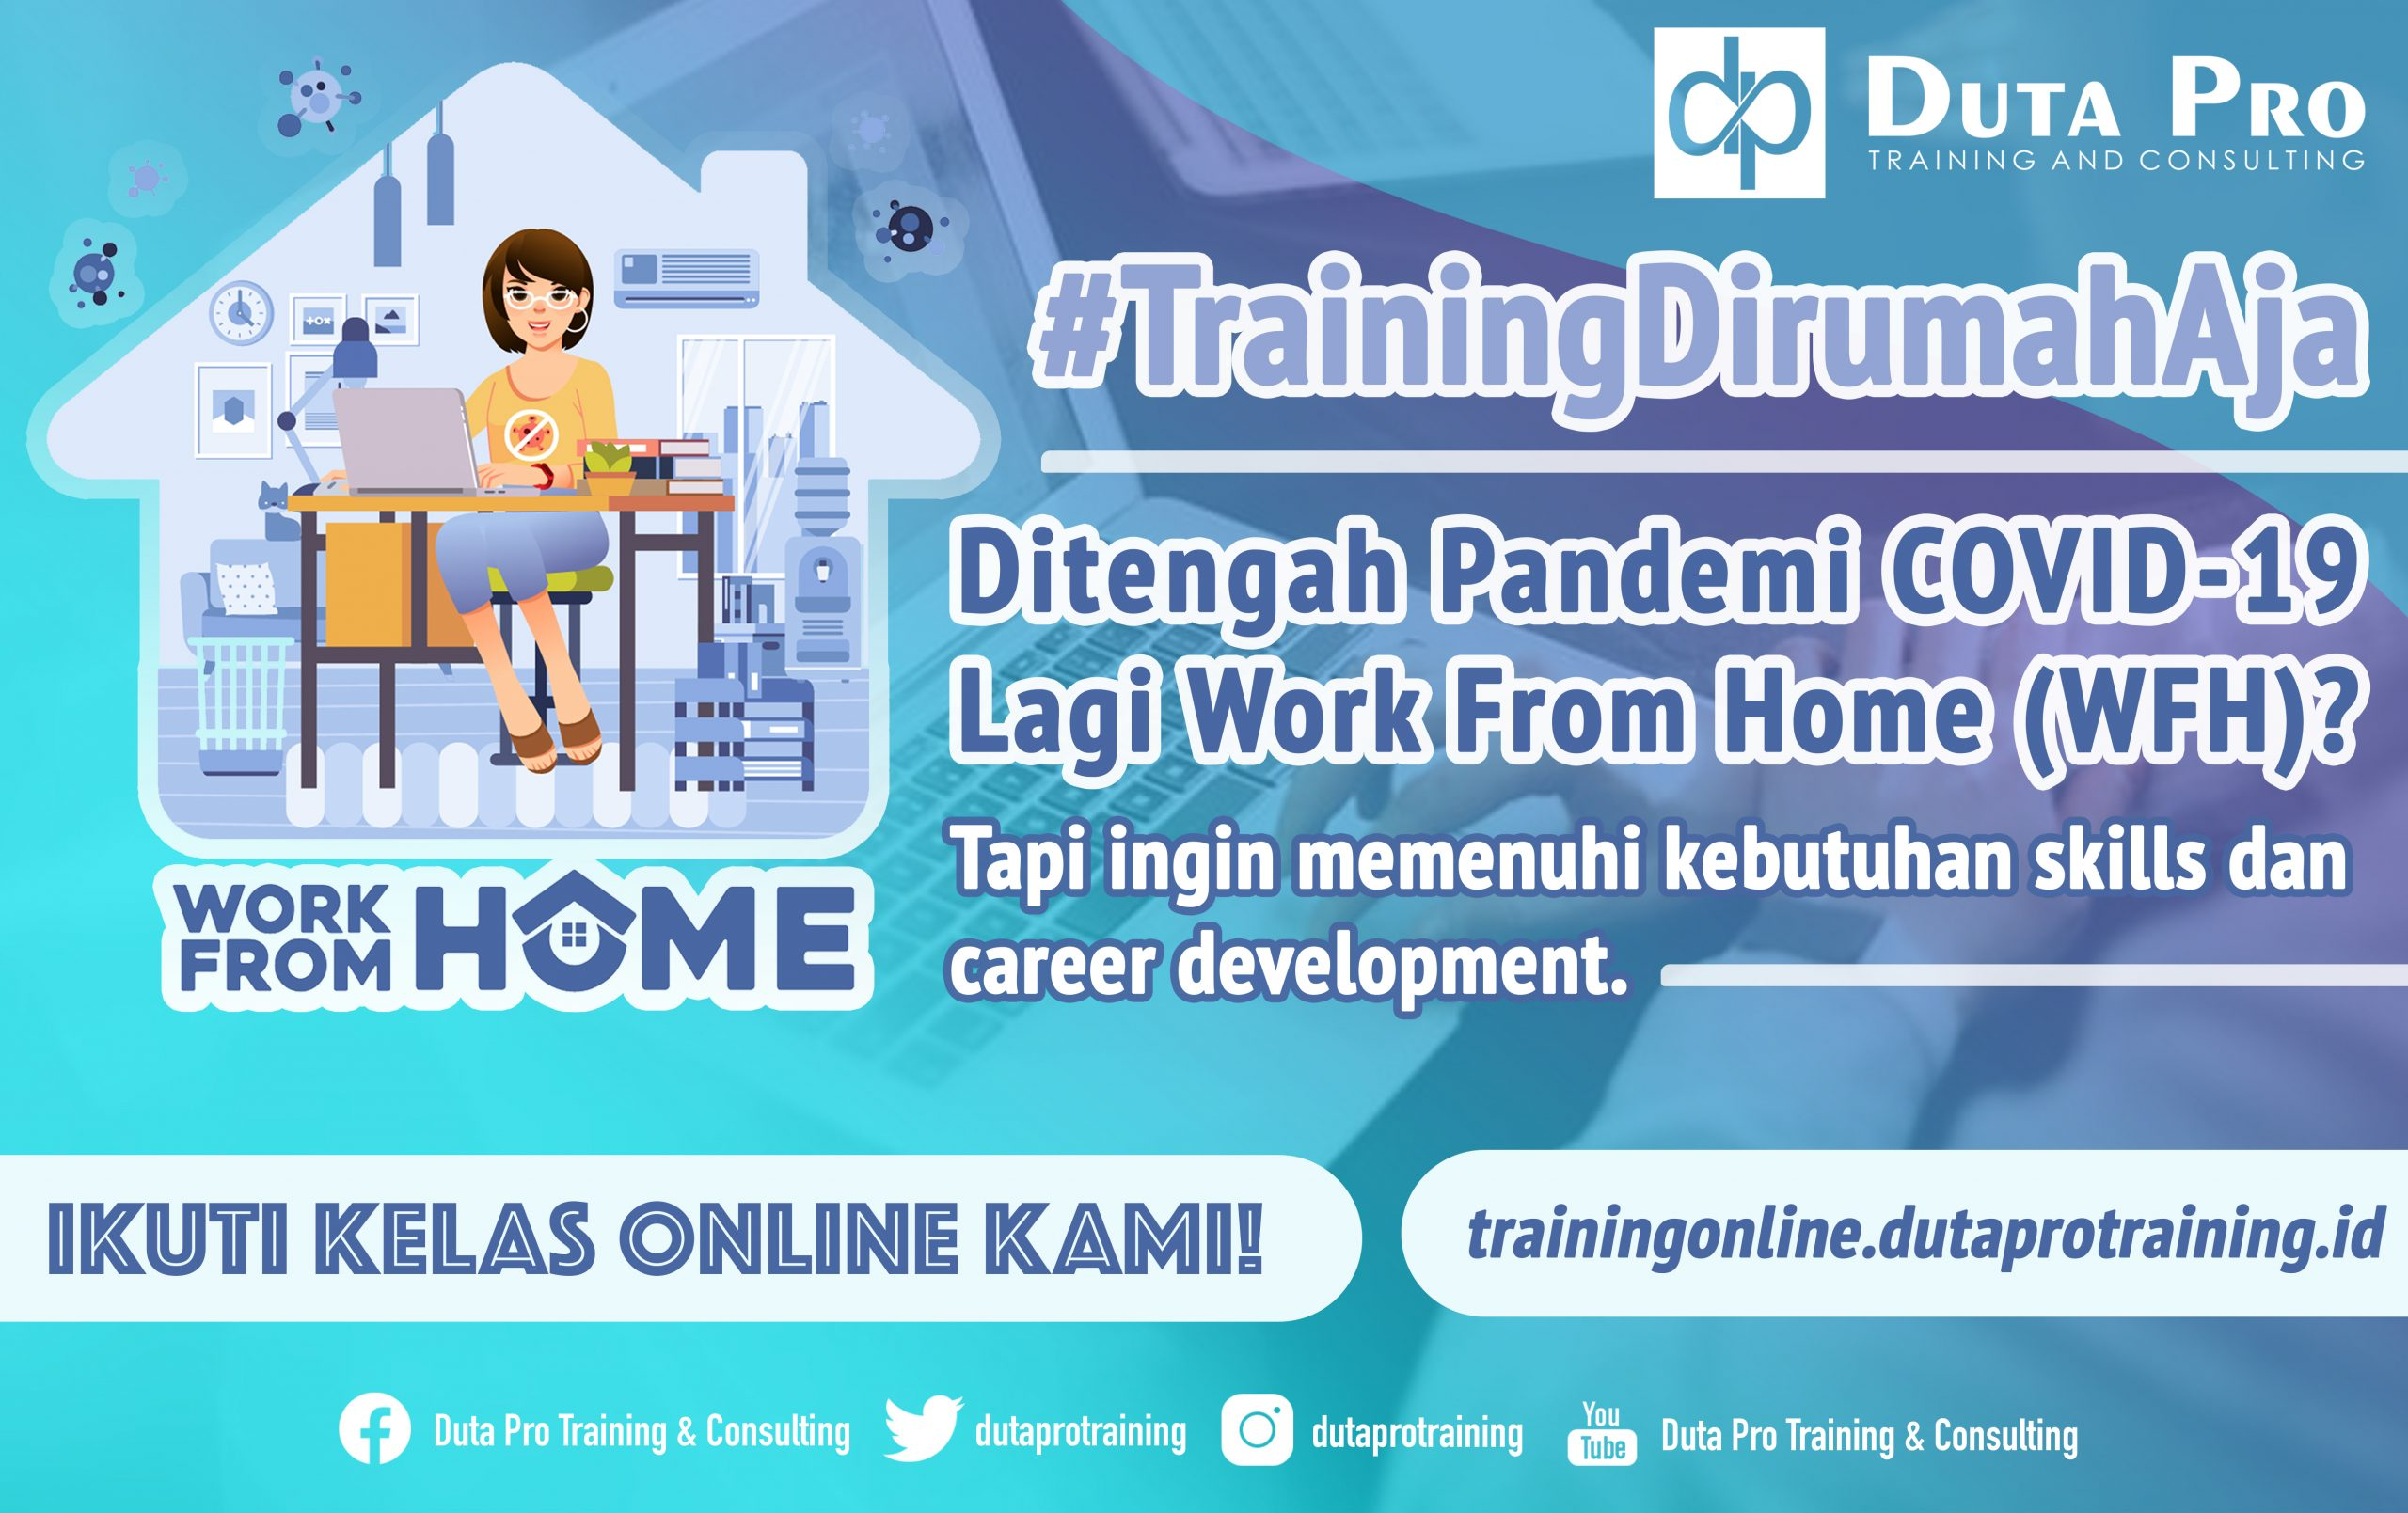 #TrainingDirumahAja dutaprotraining corona virus covid 19 training info kelas online